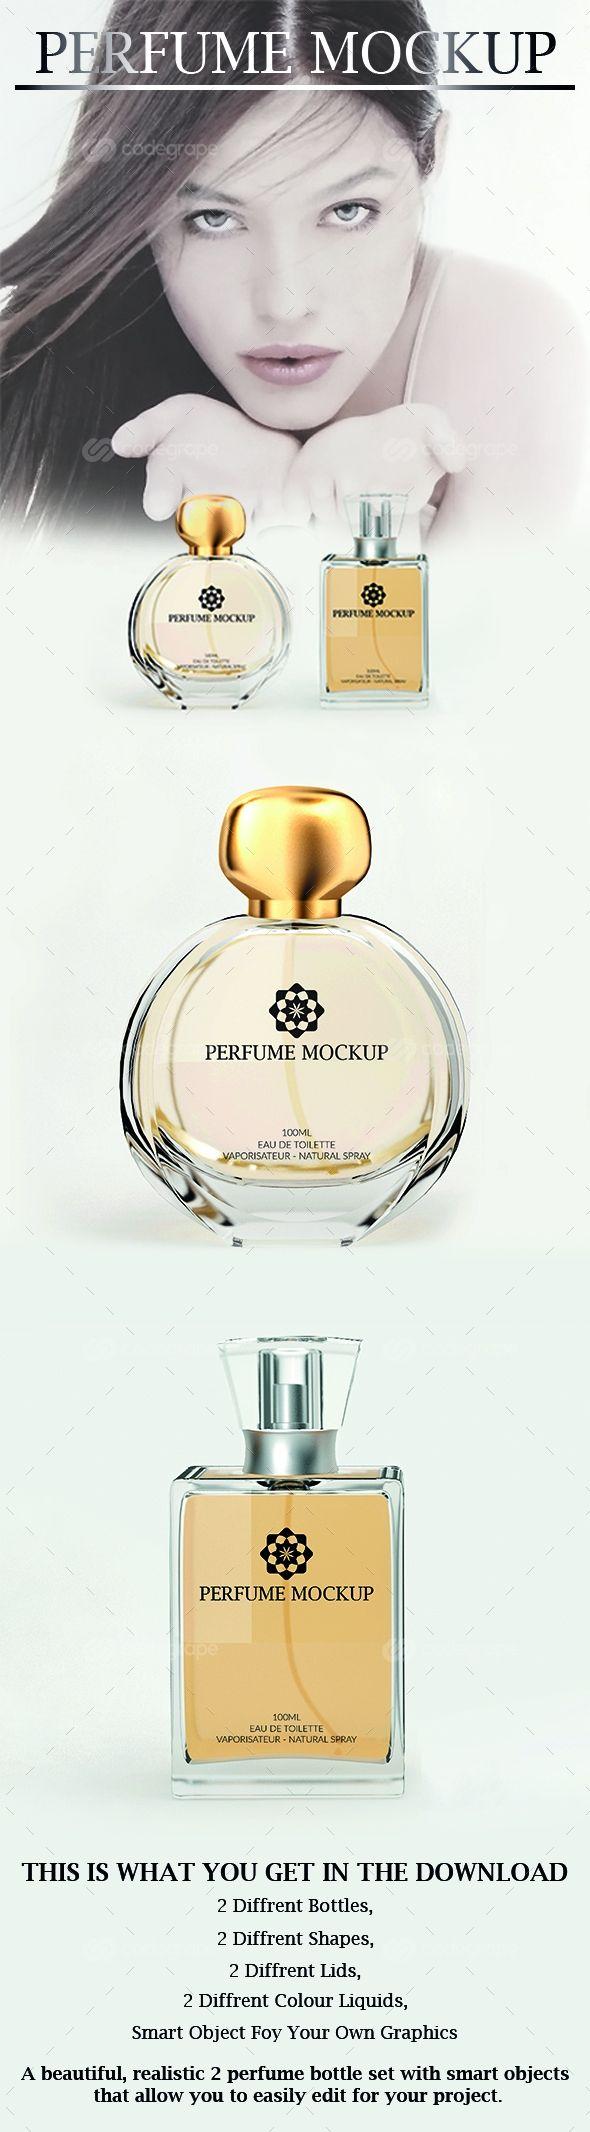 PERFUME MOCKUP on @codegrape. More Info: https://www.codegrape.com/item/perfume-mockup/11195